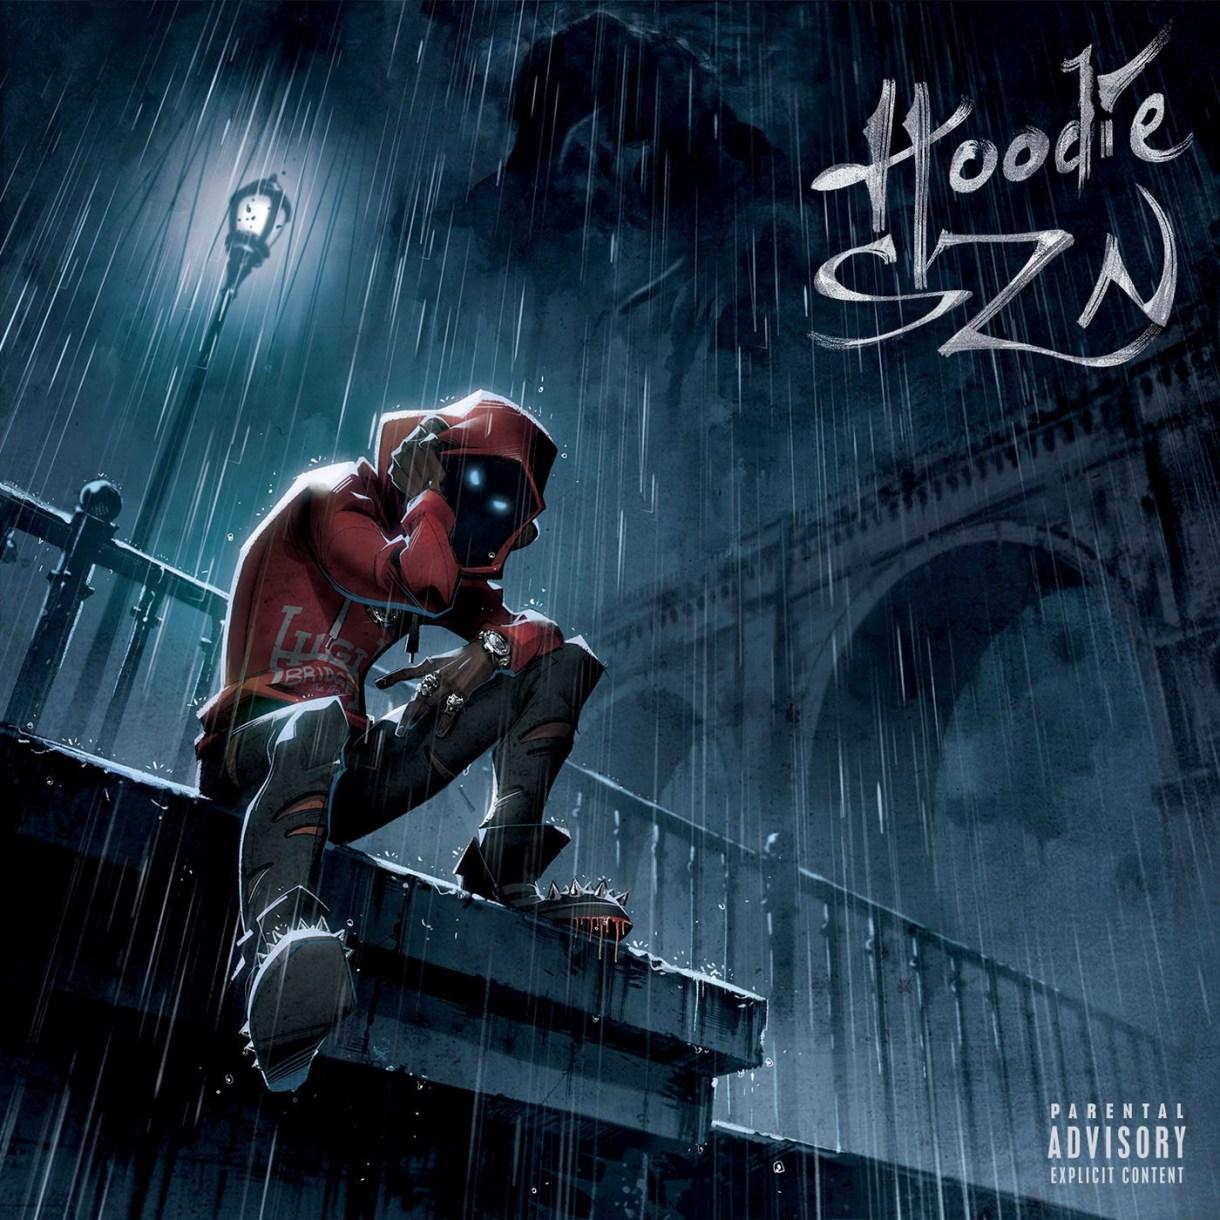 A Boogie Wit Da Hoodie - Hoodie SZN Album